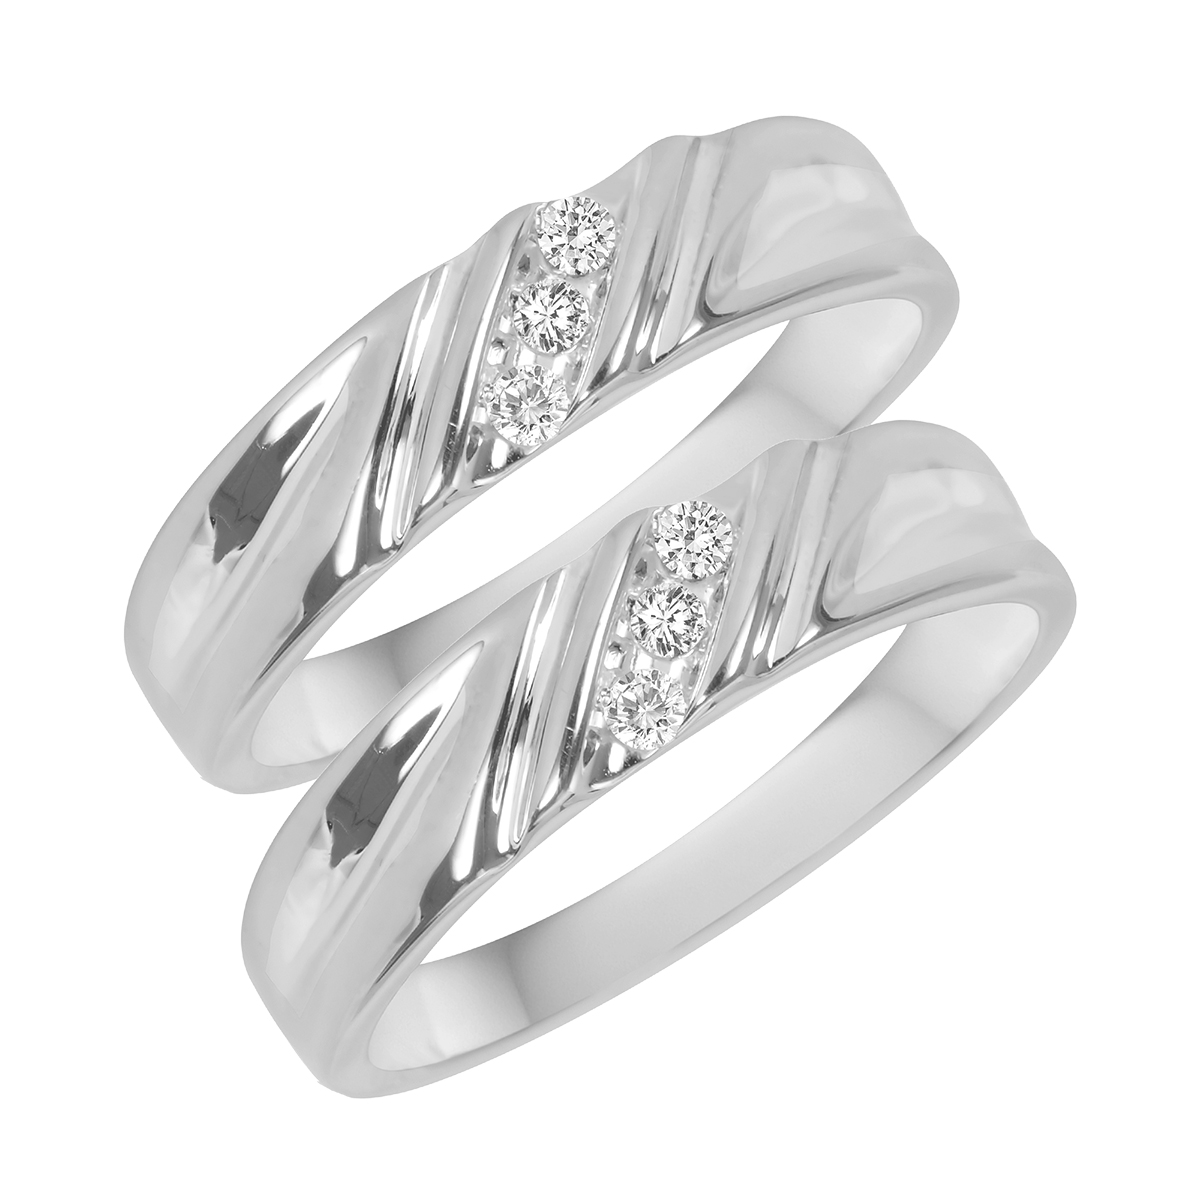 1/10 Carat T.W. Round Cut Mens  Same Sex Wedding Band Set 10K White Gold- Size 8